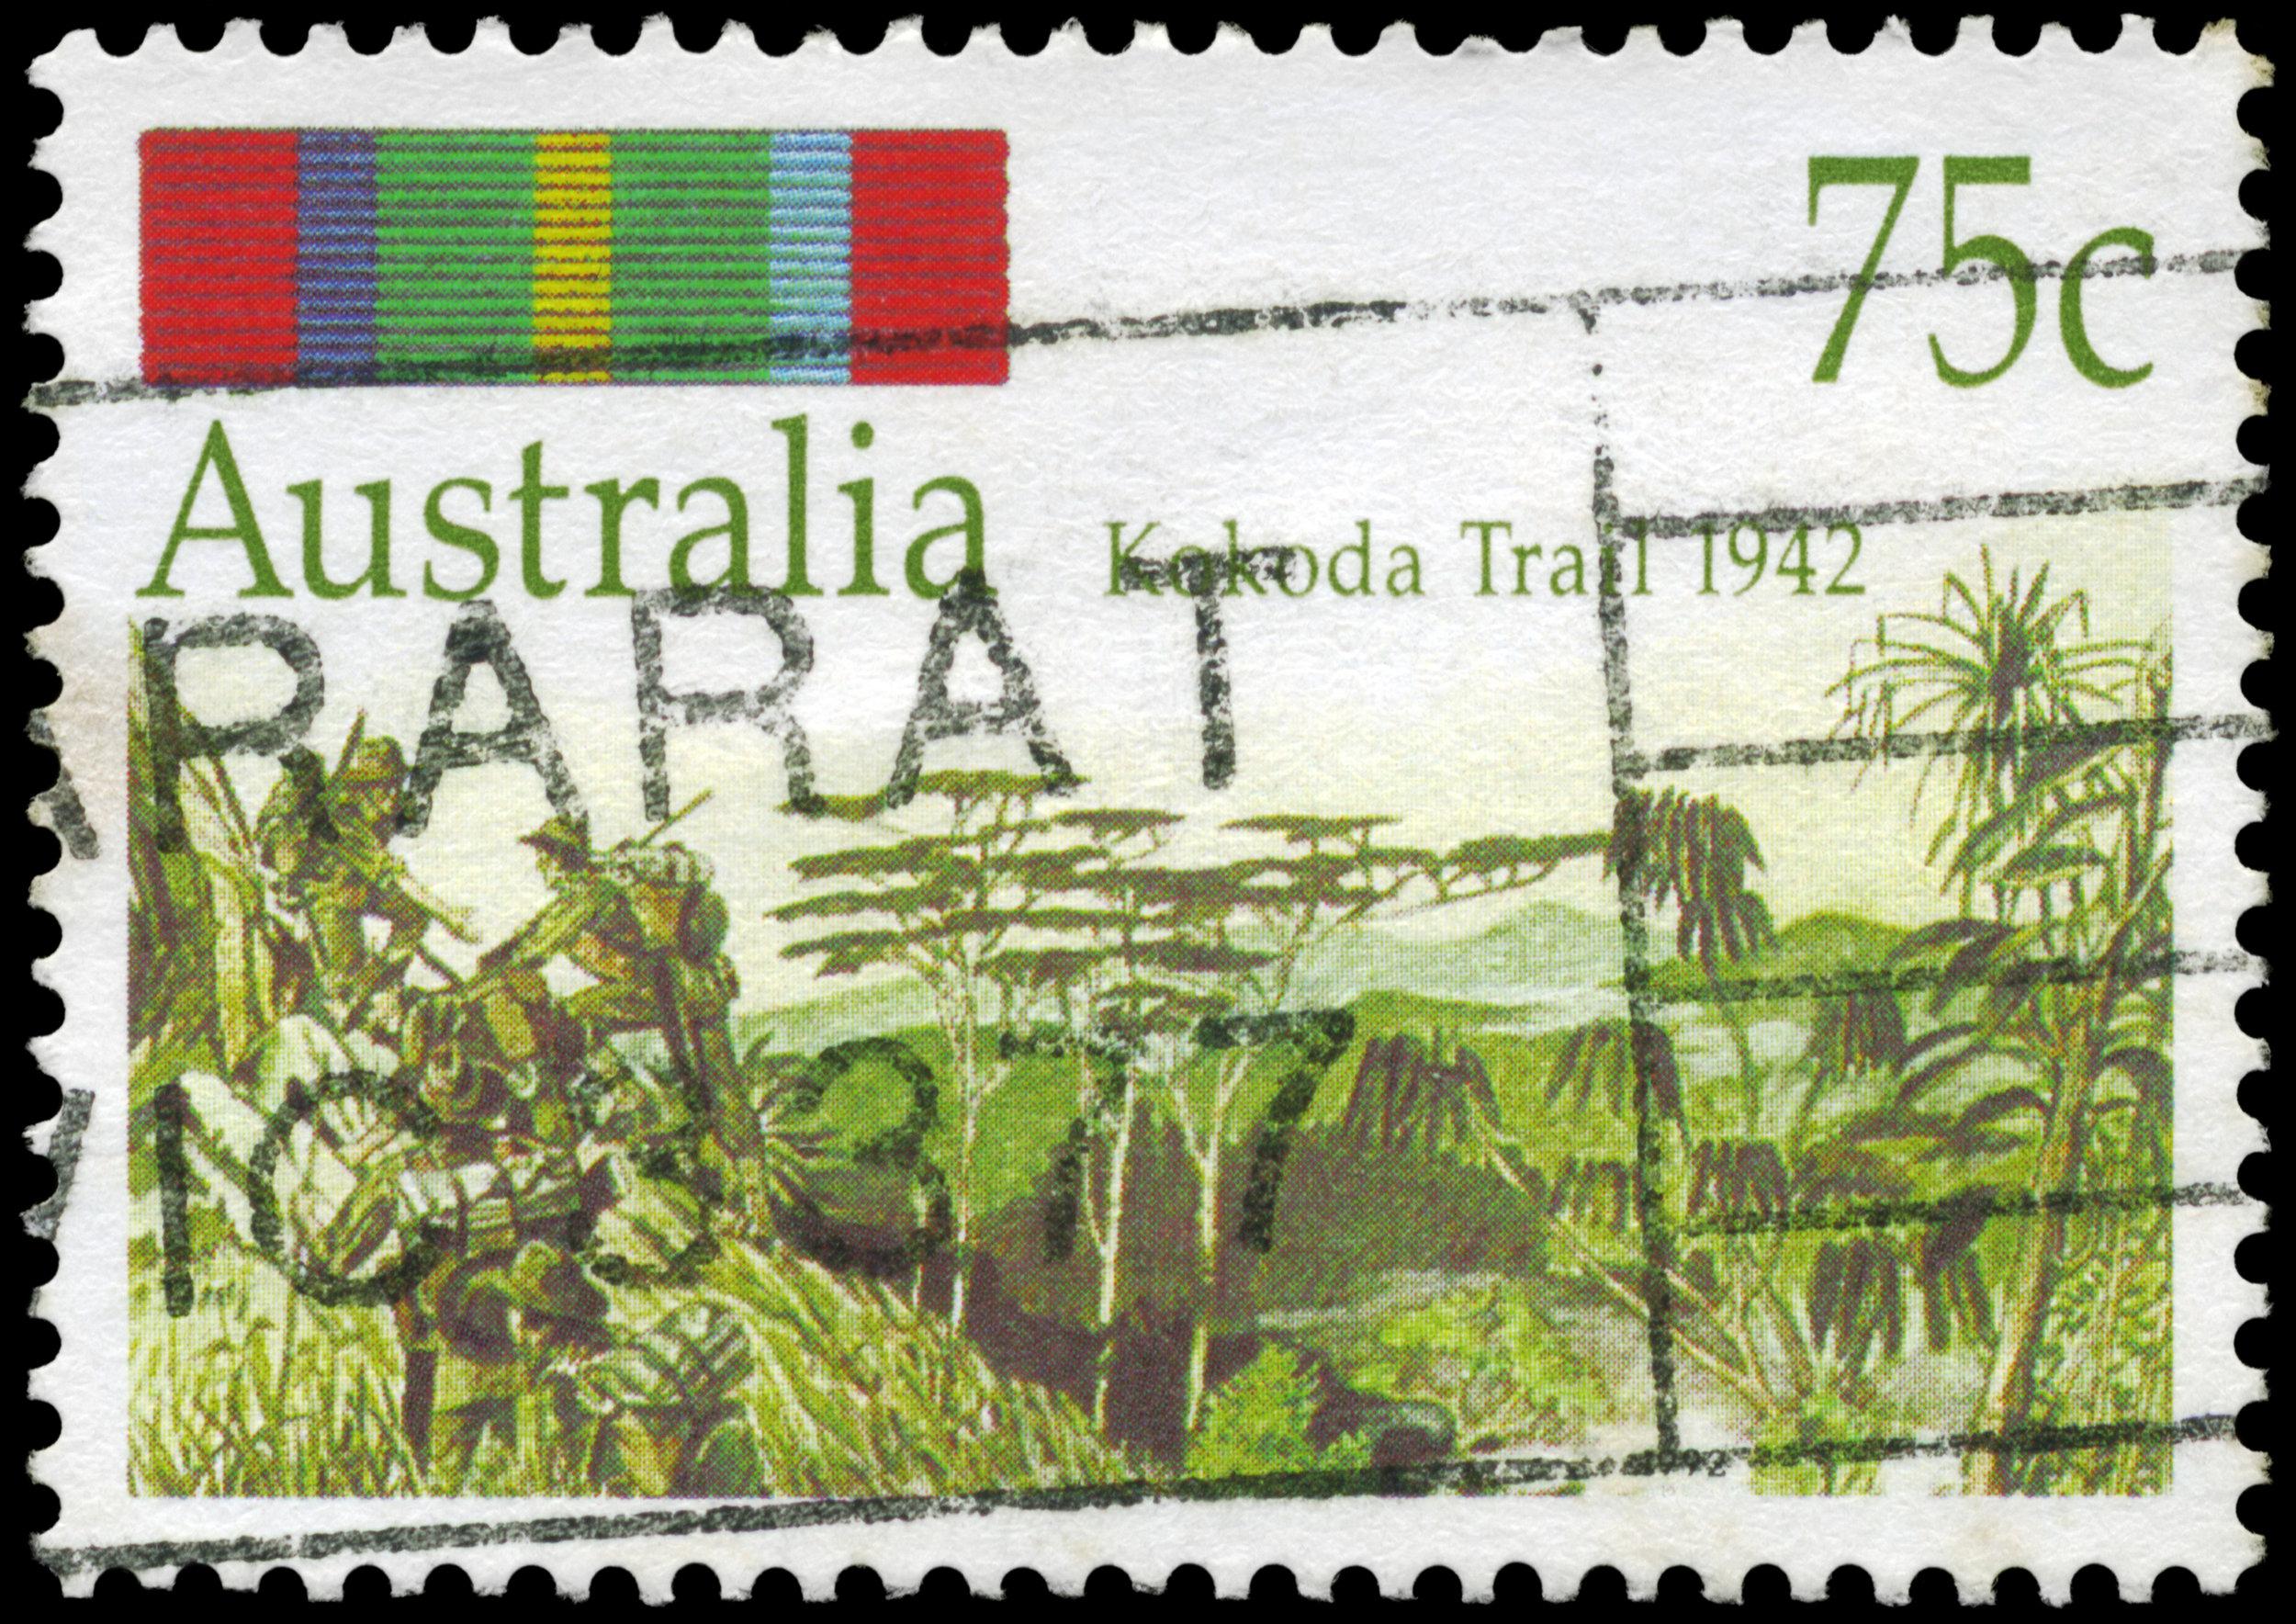 Milne Bay Kokoda Trail Stamp 1942 iStock-162242227.jpg